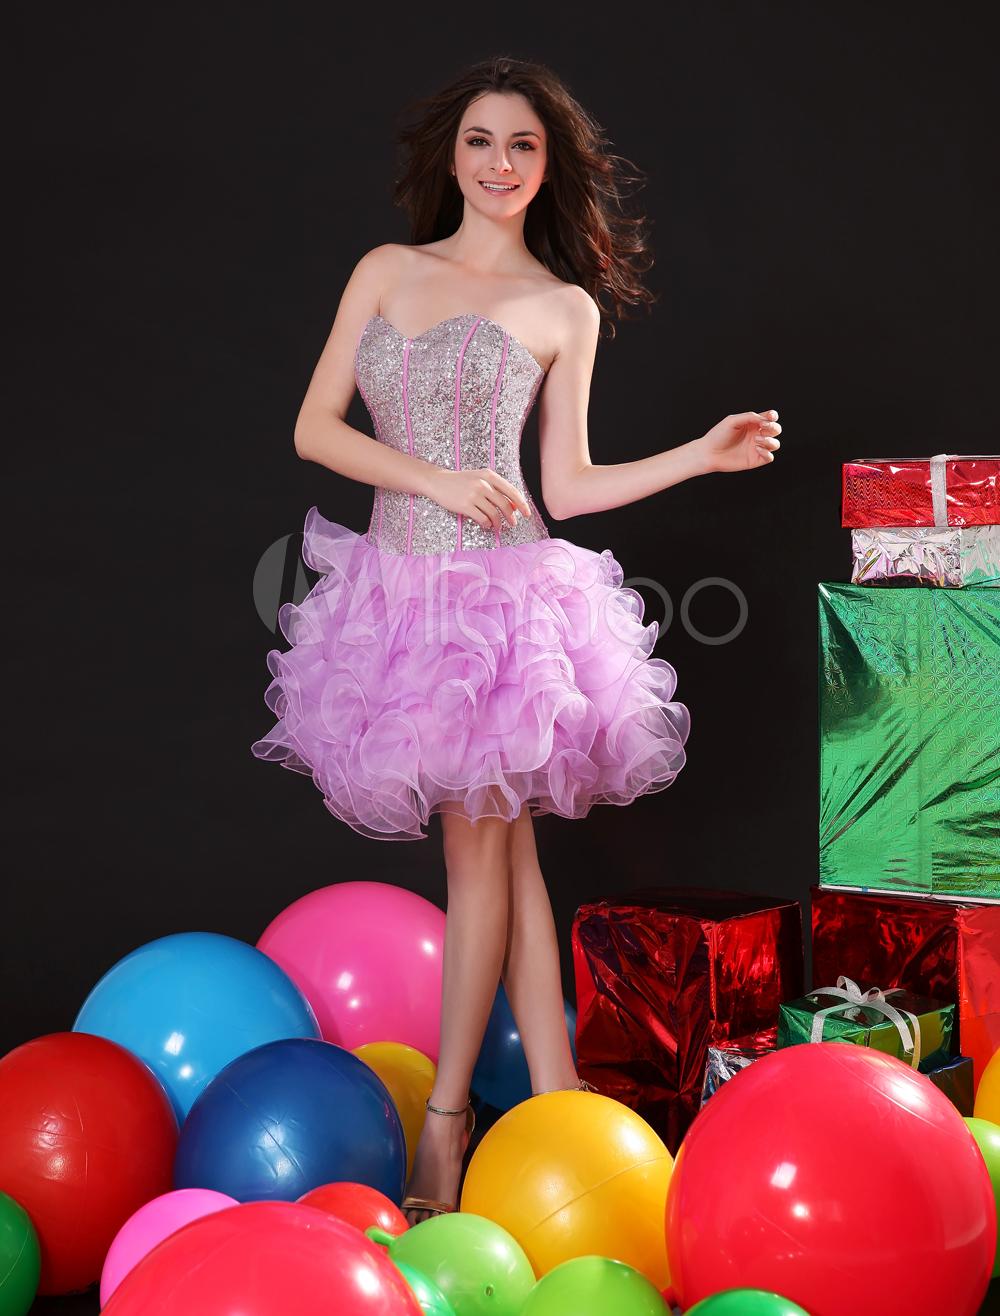 Sequin Prom Dress Fuchsia Pink Sweetheart Strapless Party Dress Ruffles Organza Homecoming Dress (Wedding) photo